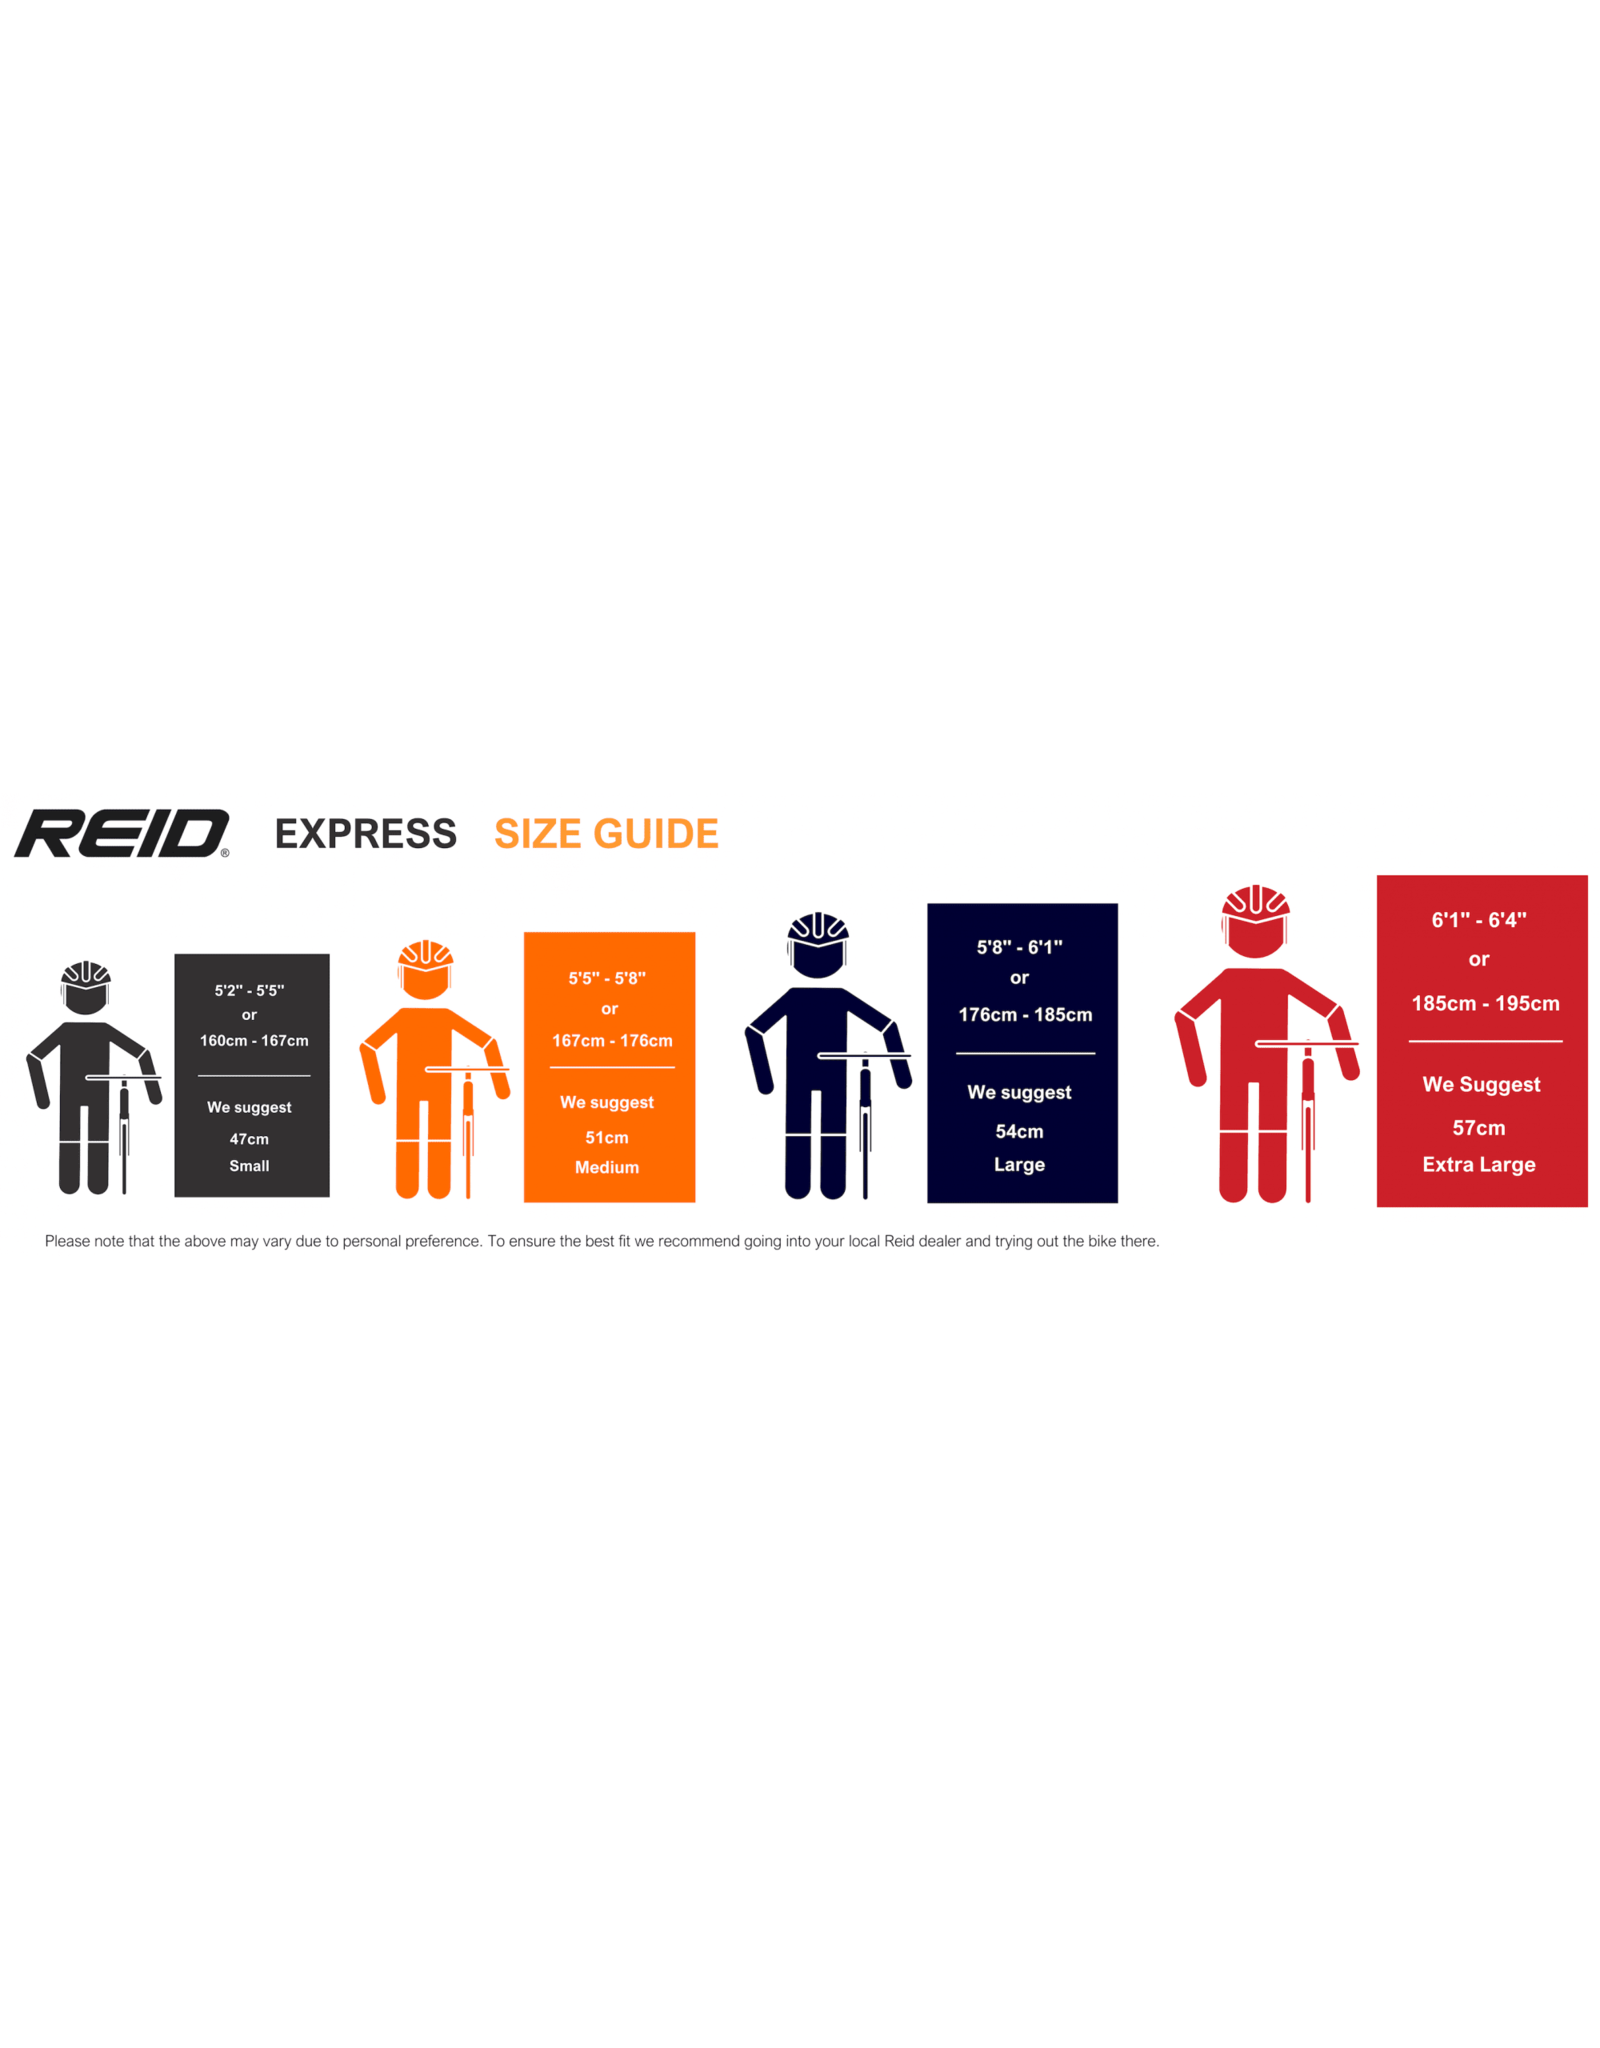 Reid Express